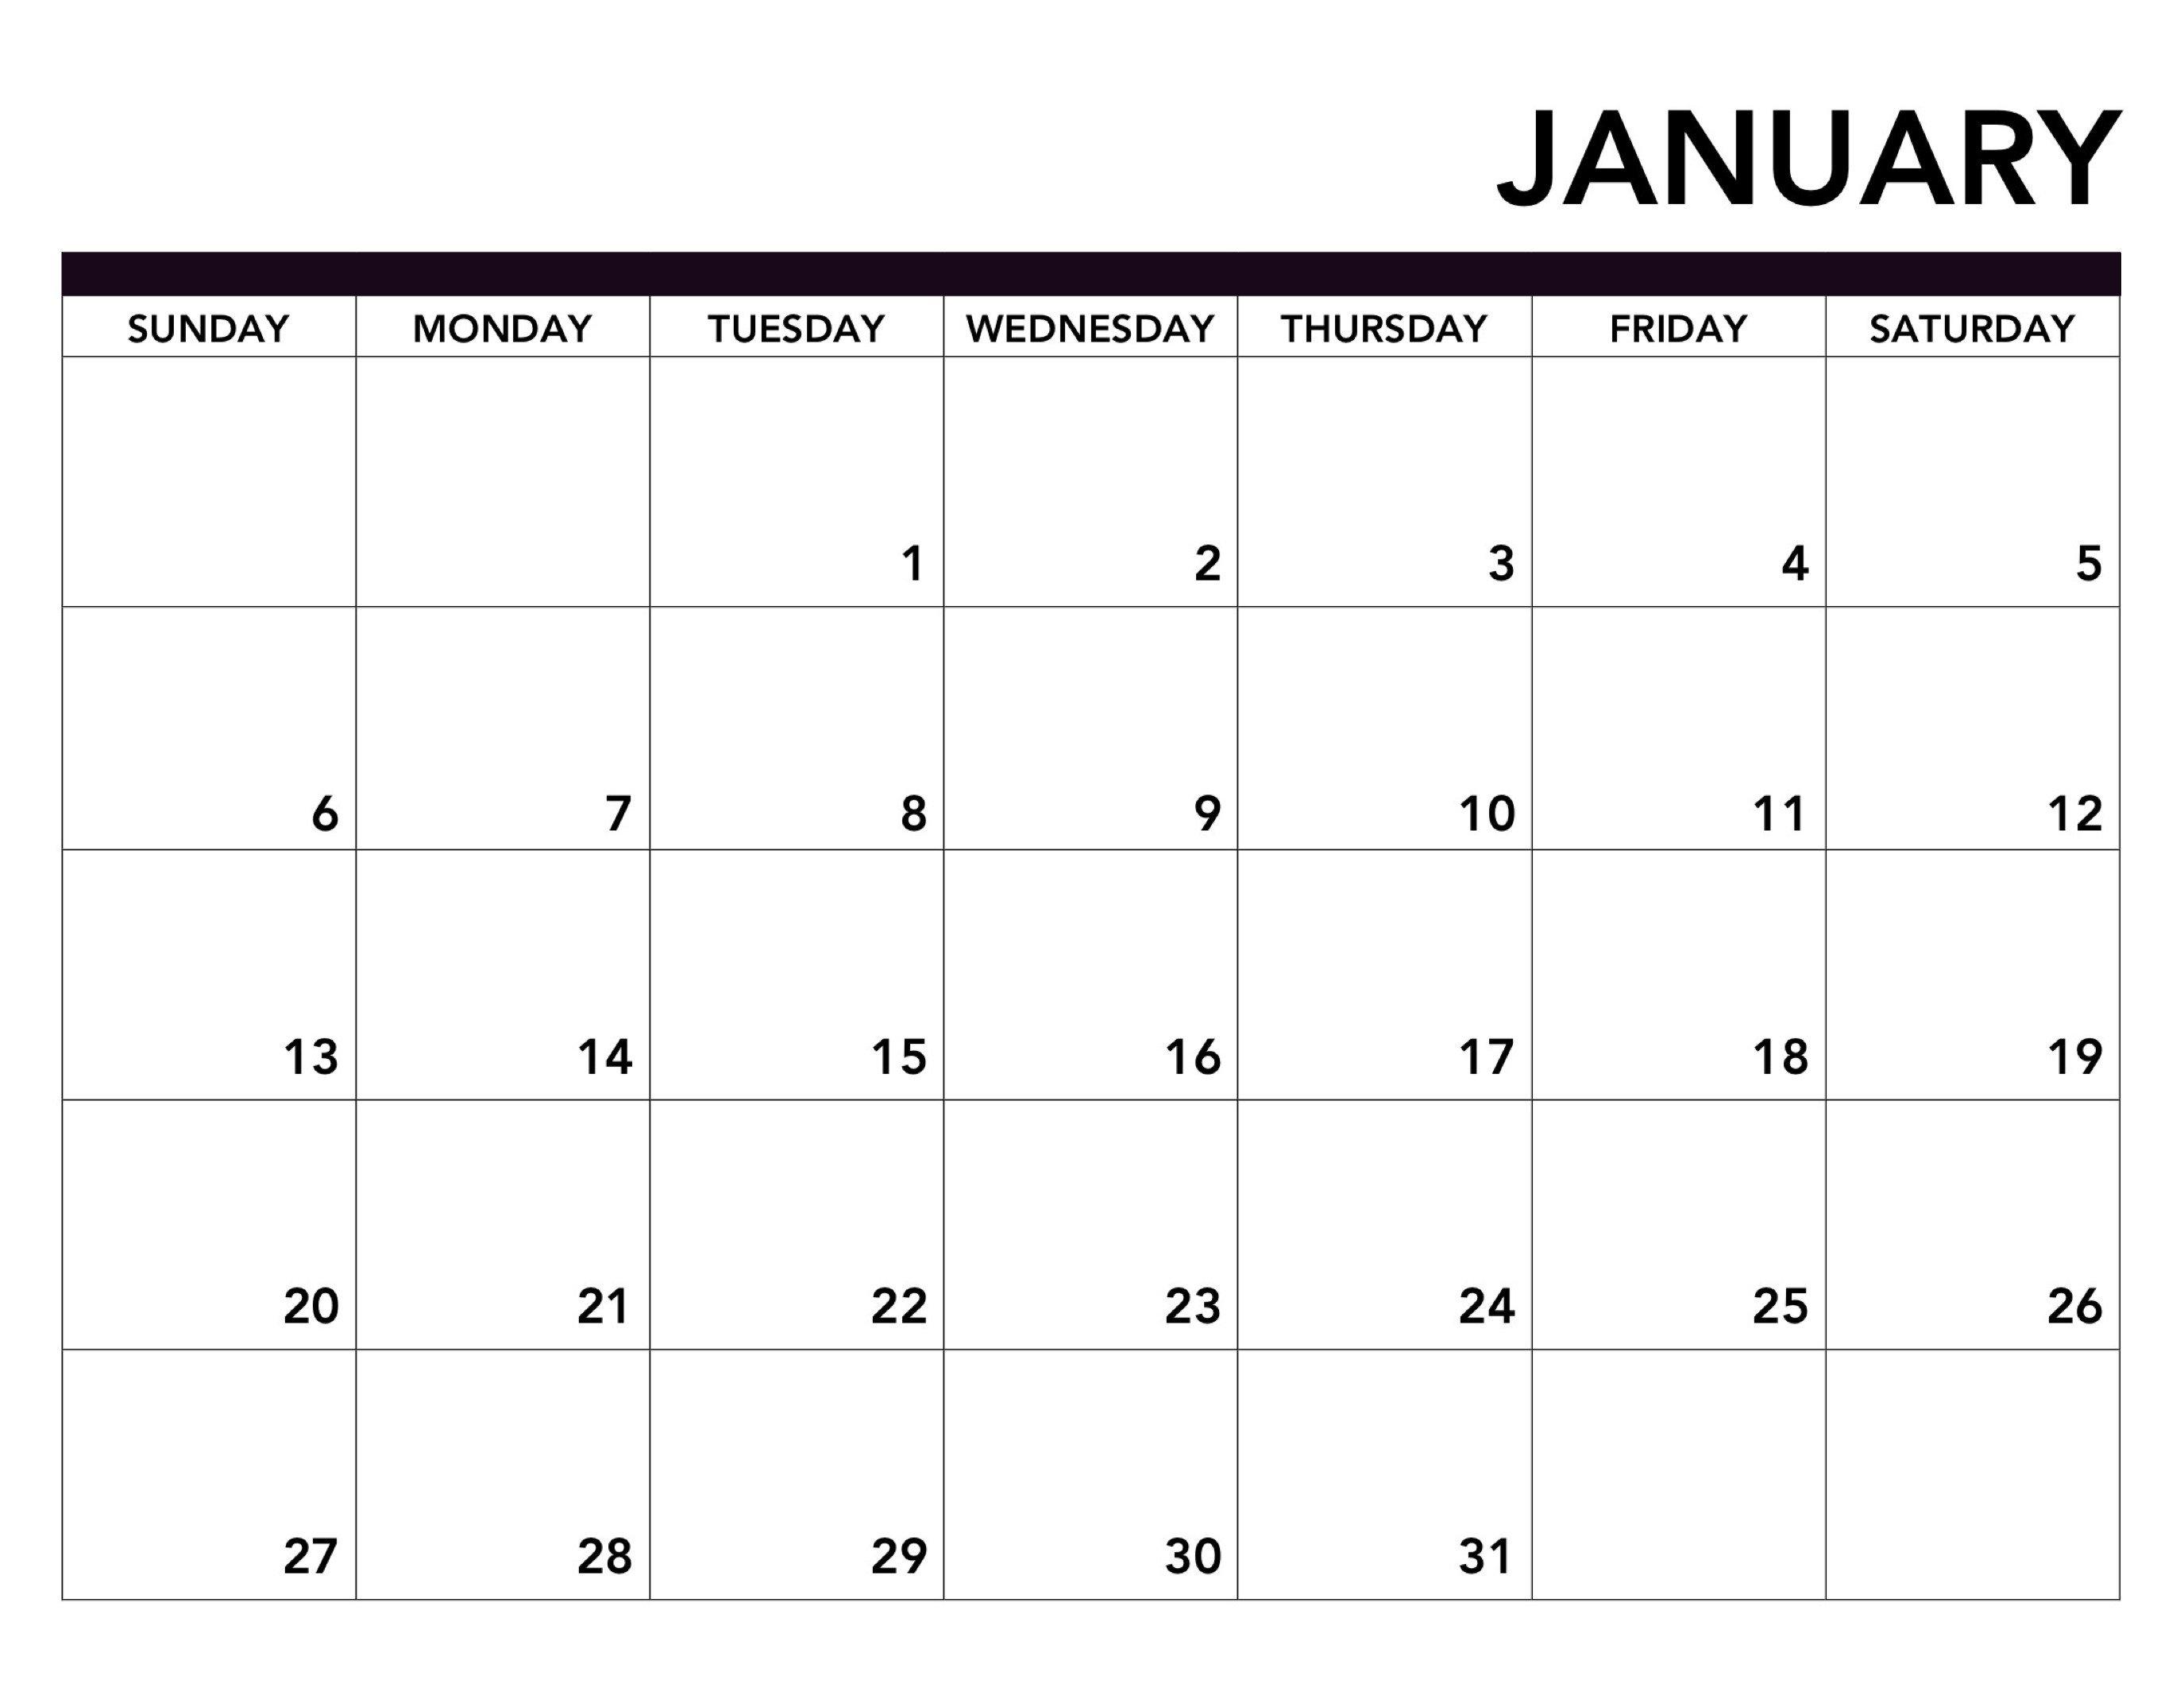 2019 Printable Calendar Free Pages - Paper Trail Design Calendar 2019 Pages